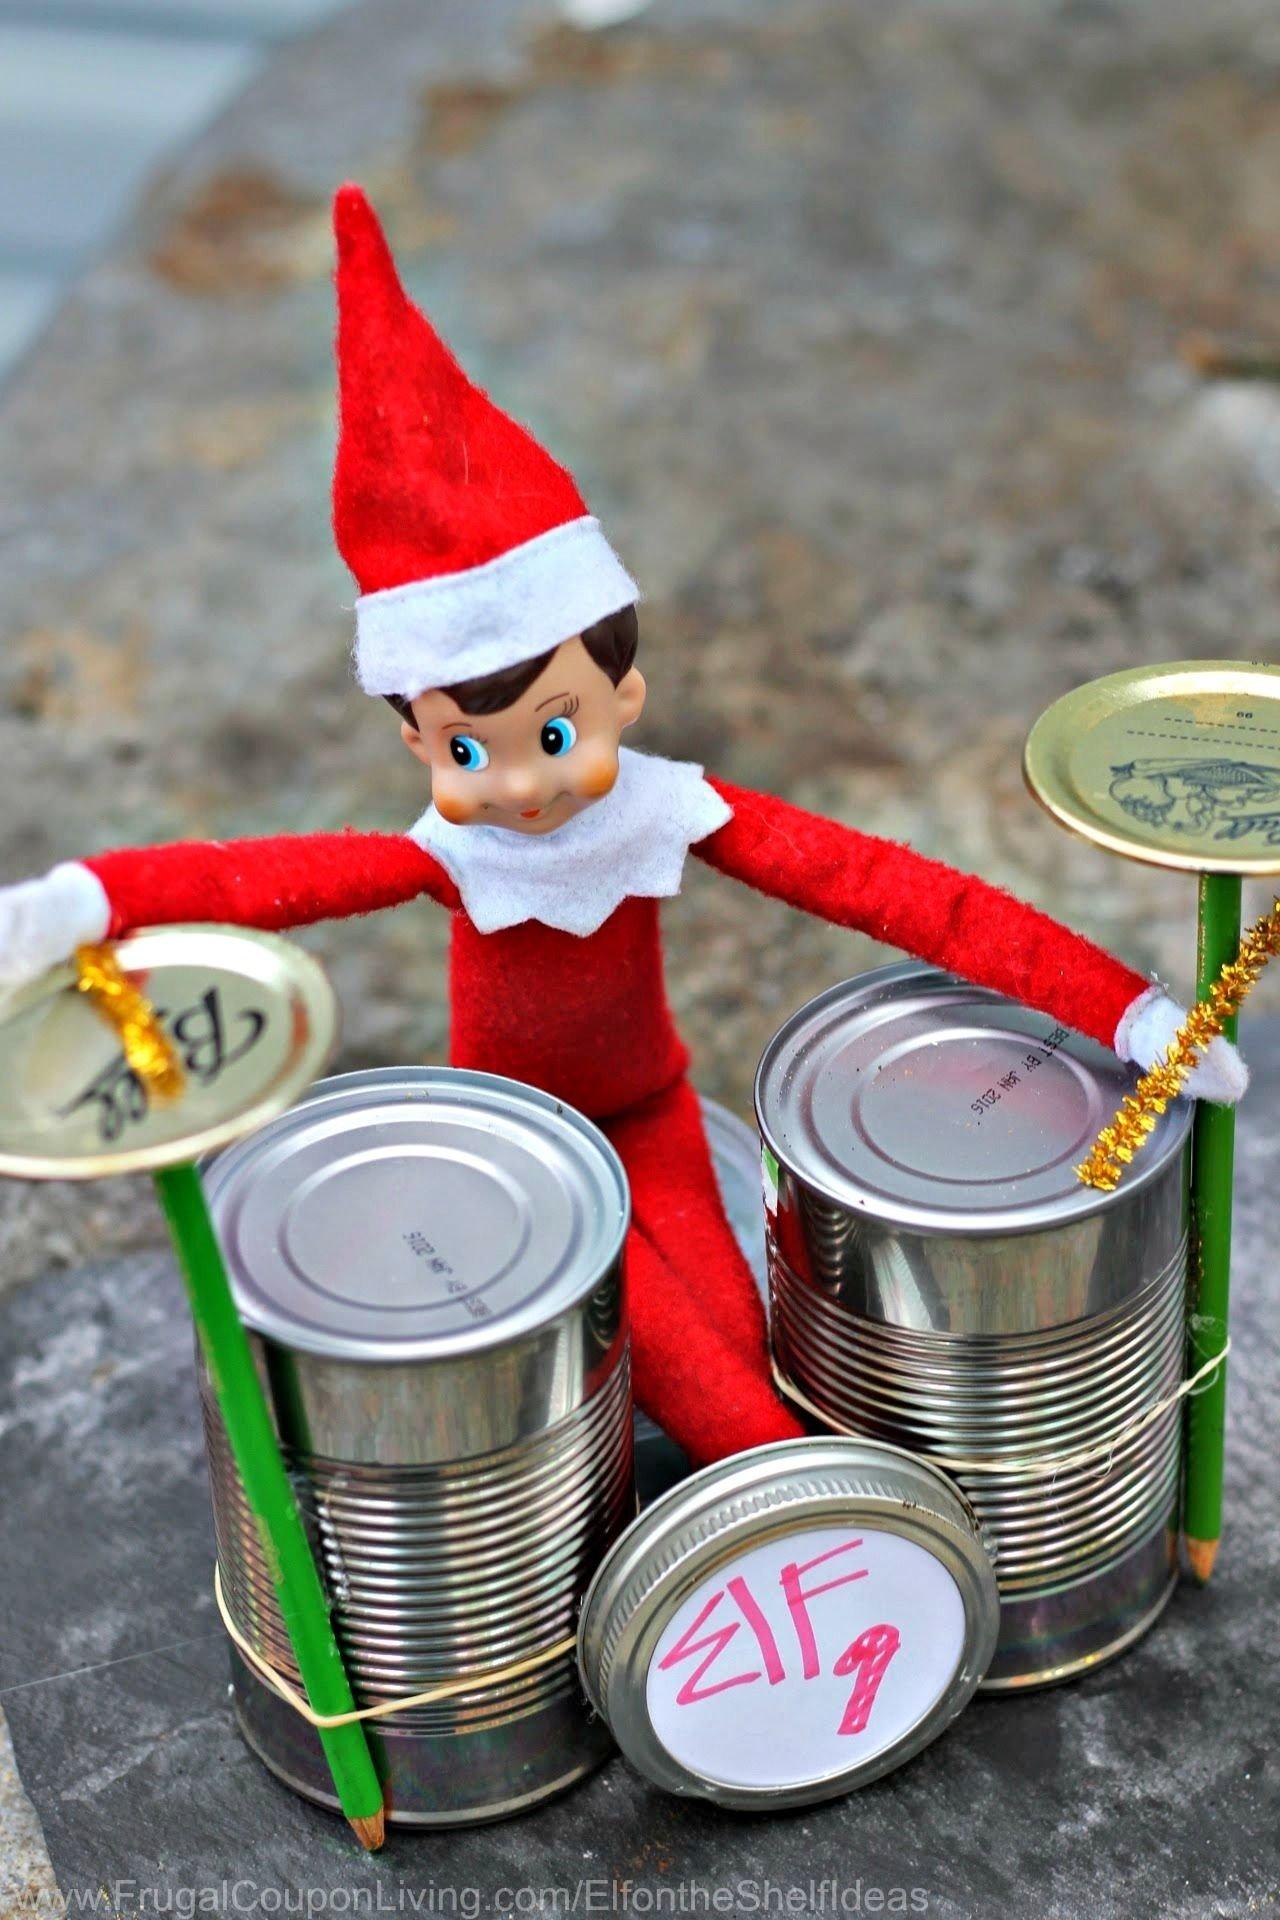 10 Stunning Elf On The Shelf Creative Ideas elf on the shelf ideas elf rock band with cans elf ideas shelf 2020